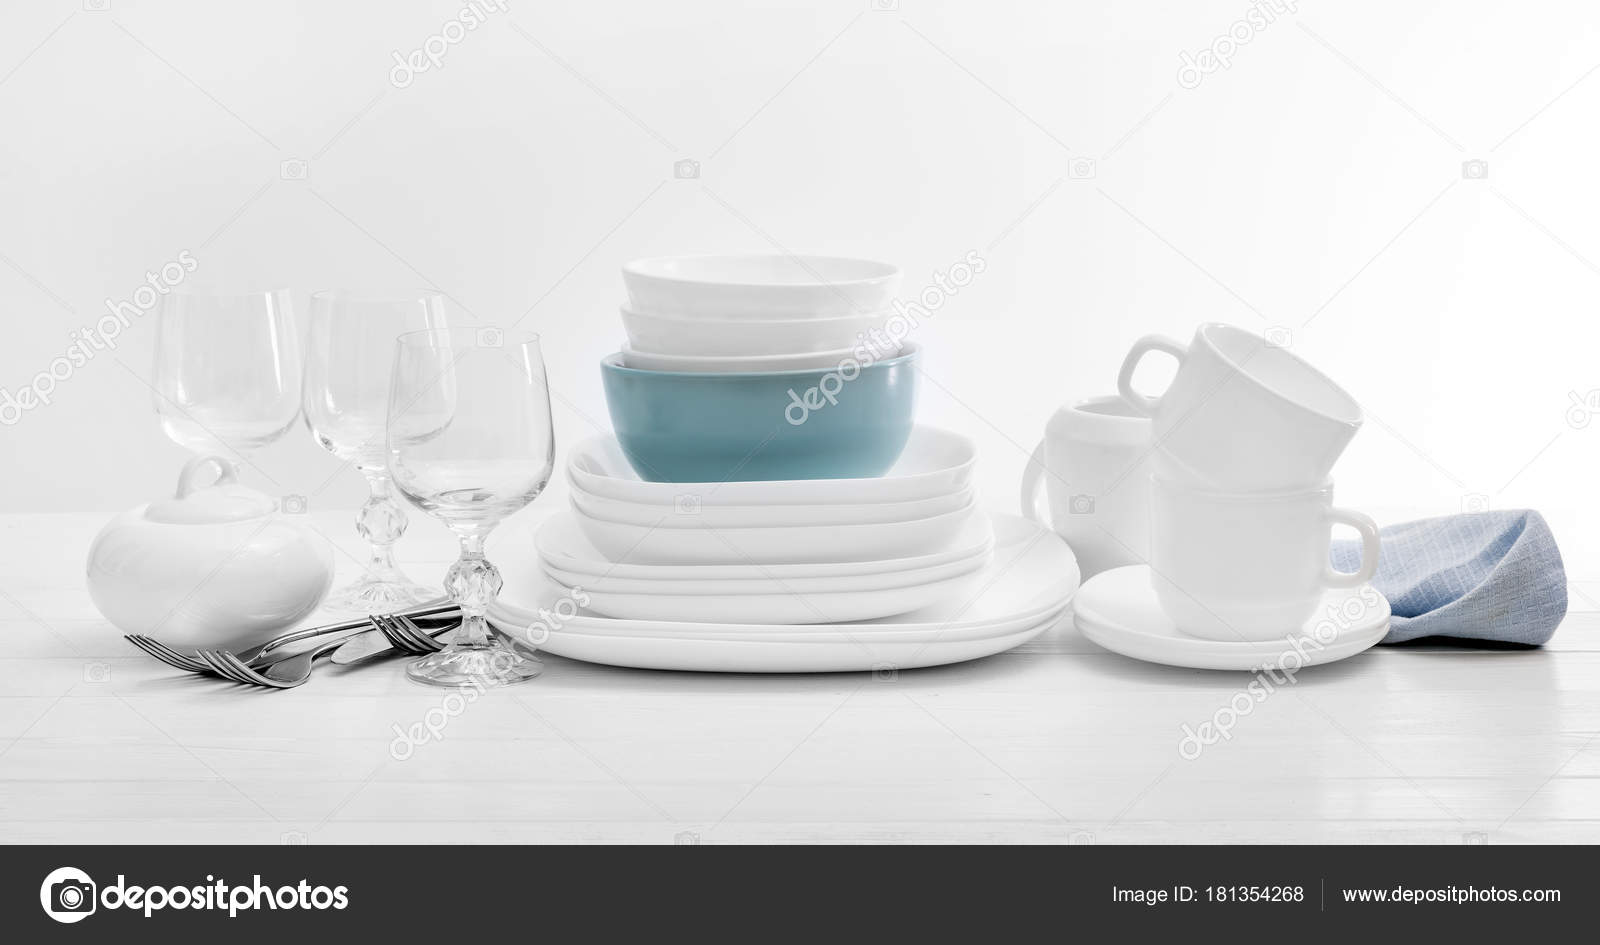 White square dinnerware set with glasses u2014 Stock Photo & White square dinnerware set with glasses u2014 Stock Photo © tan4ikk ...